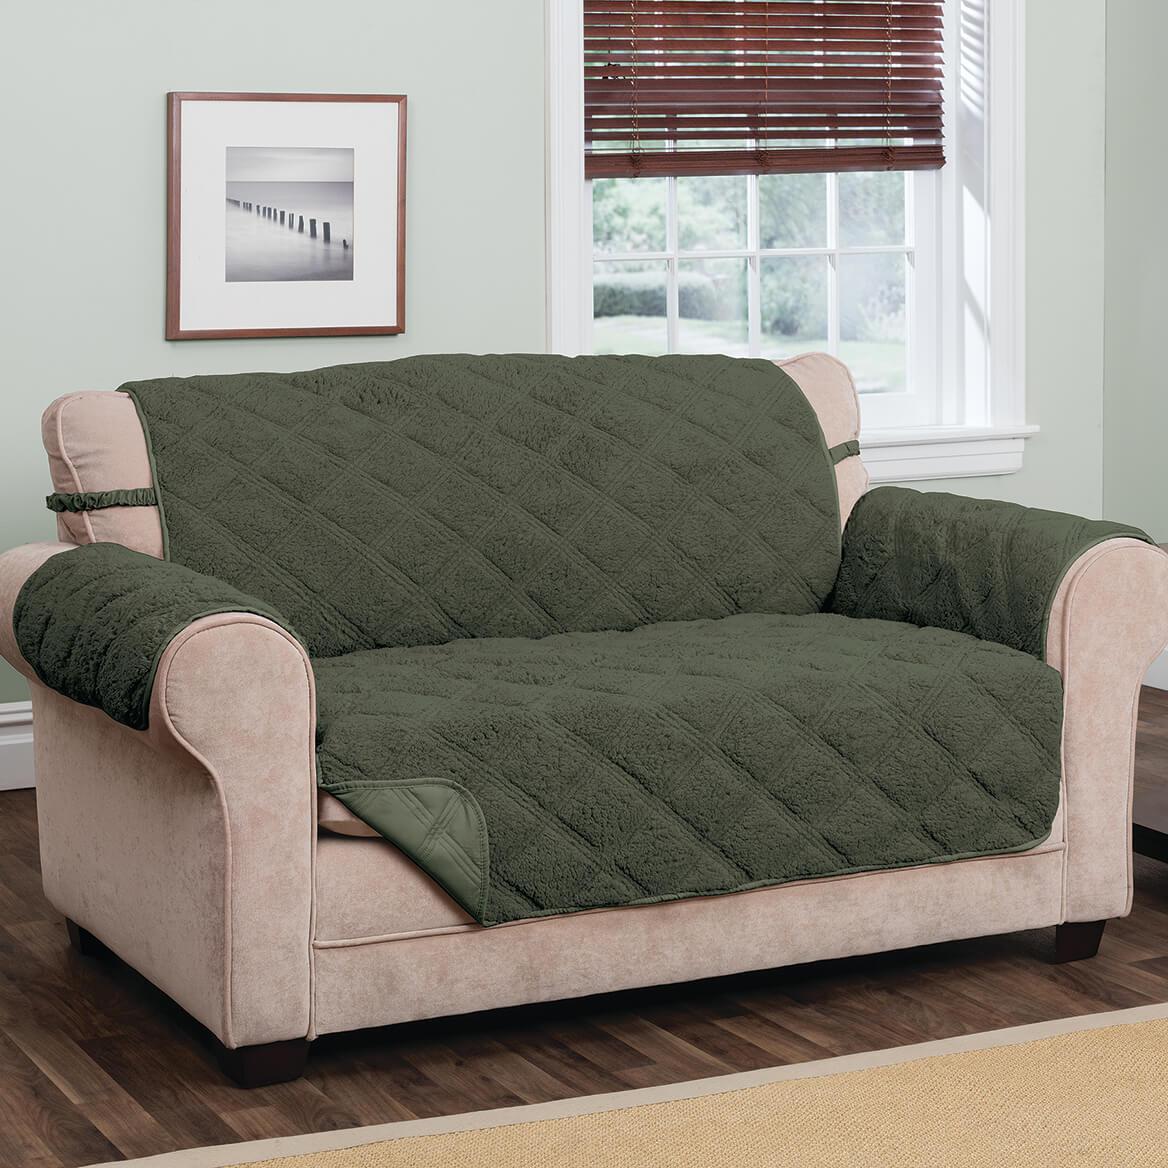 Hudson Waterproof Sherpa Sofa Protector by OakRidge-365404